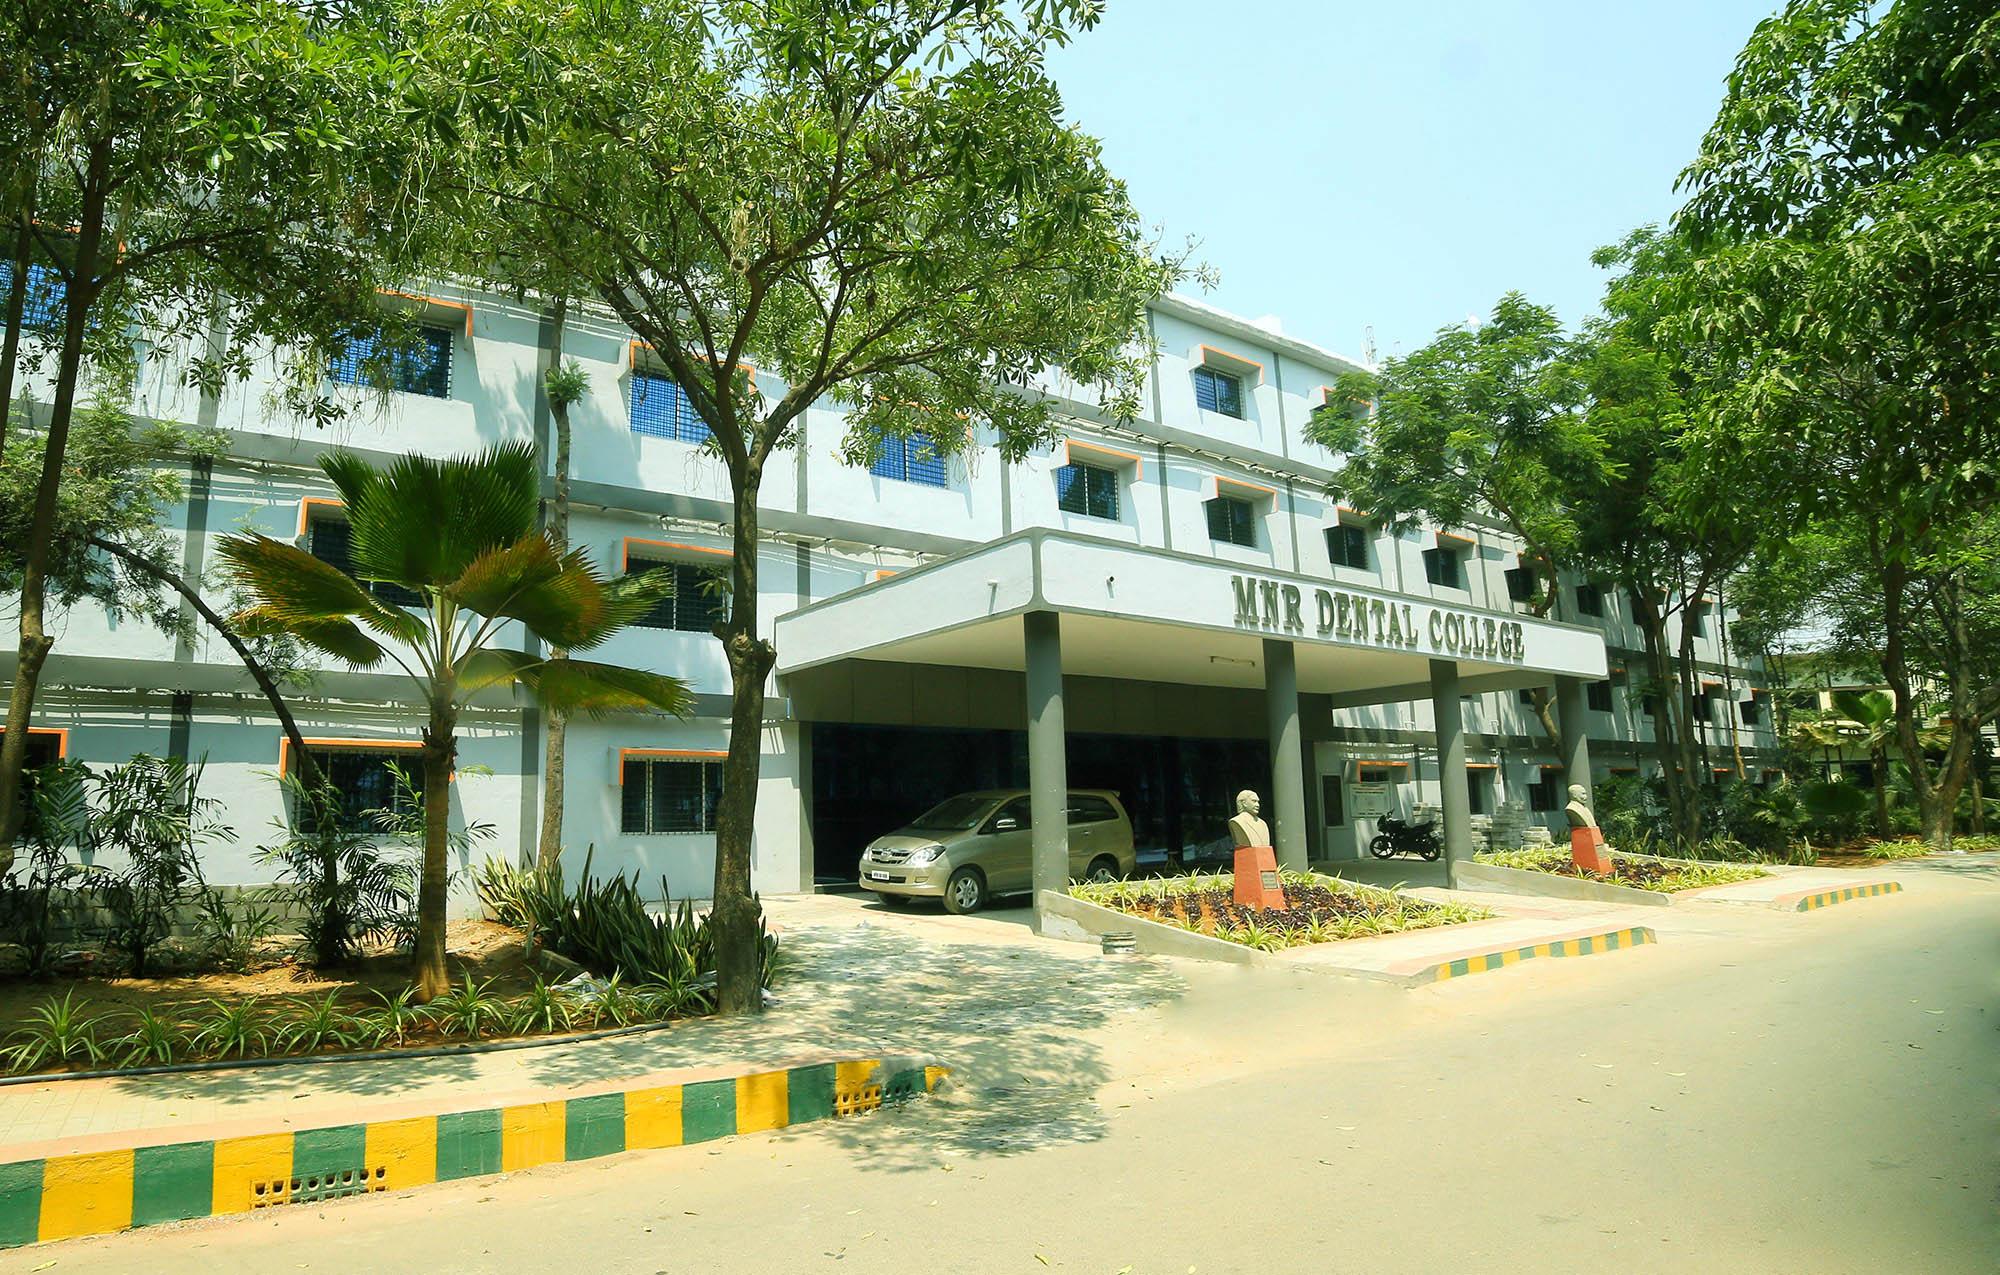 Mnr Dental College and Hospital, Hyderabad Image